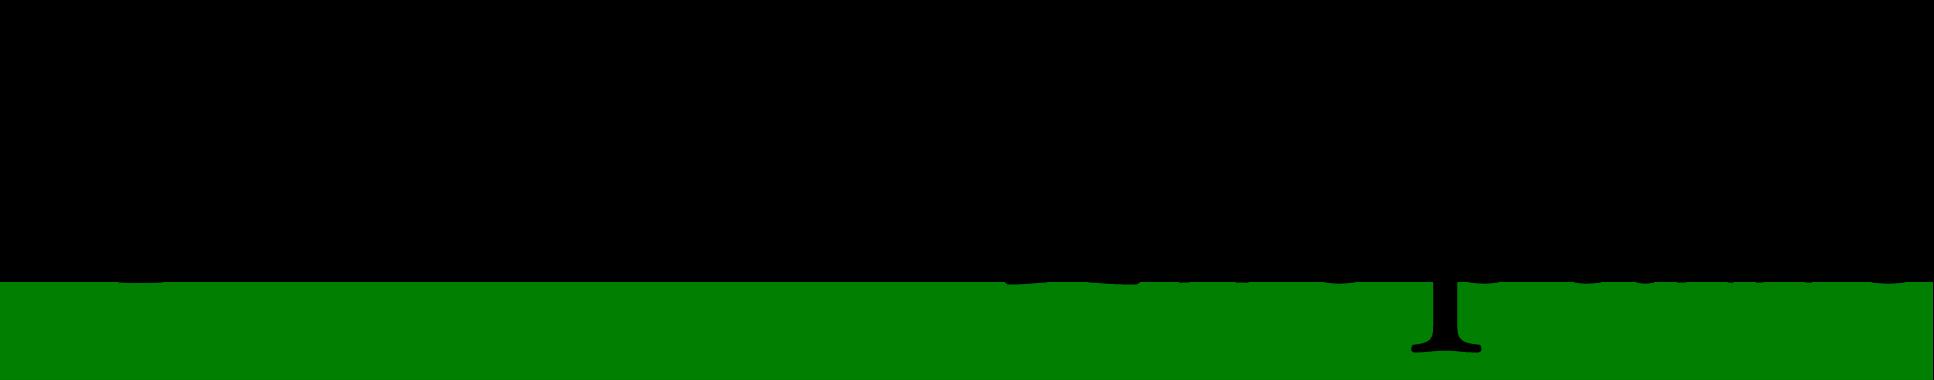 Greens Propane Logo